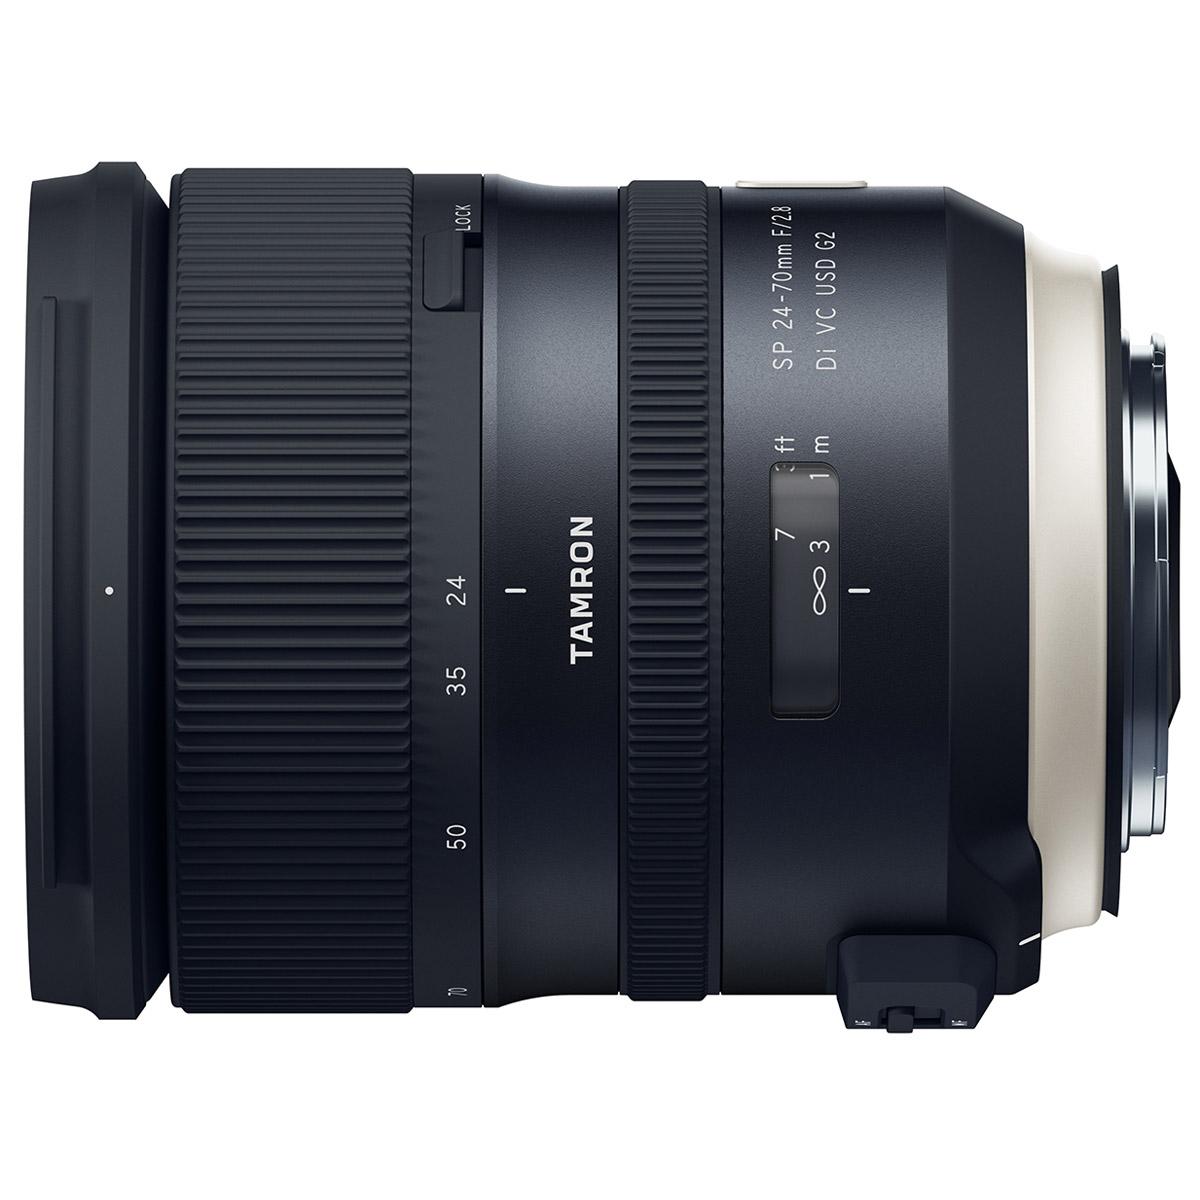 Tamron-SP-24-70mm-f-2-8-Di-VC-USD-G2-Lens-for-Nikon-amp-Canon-Mount